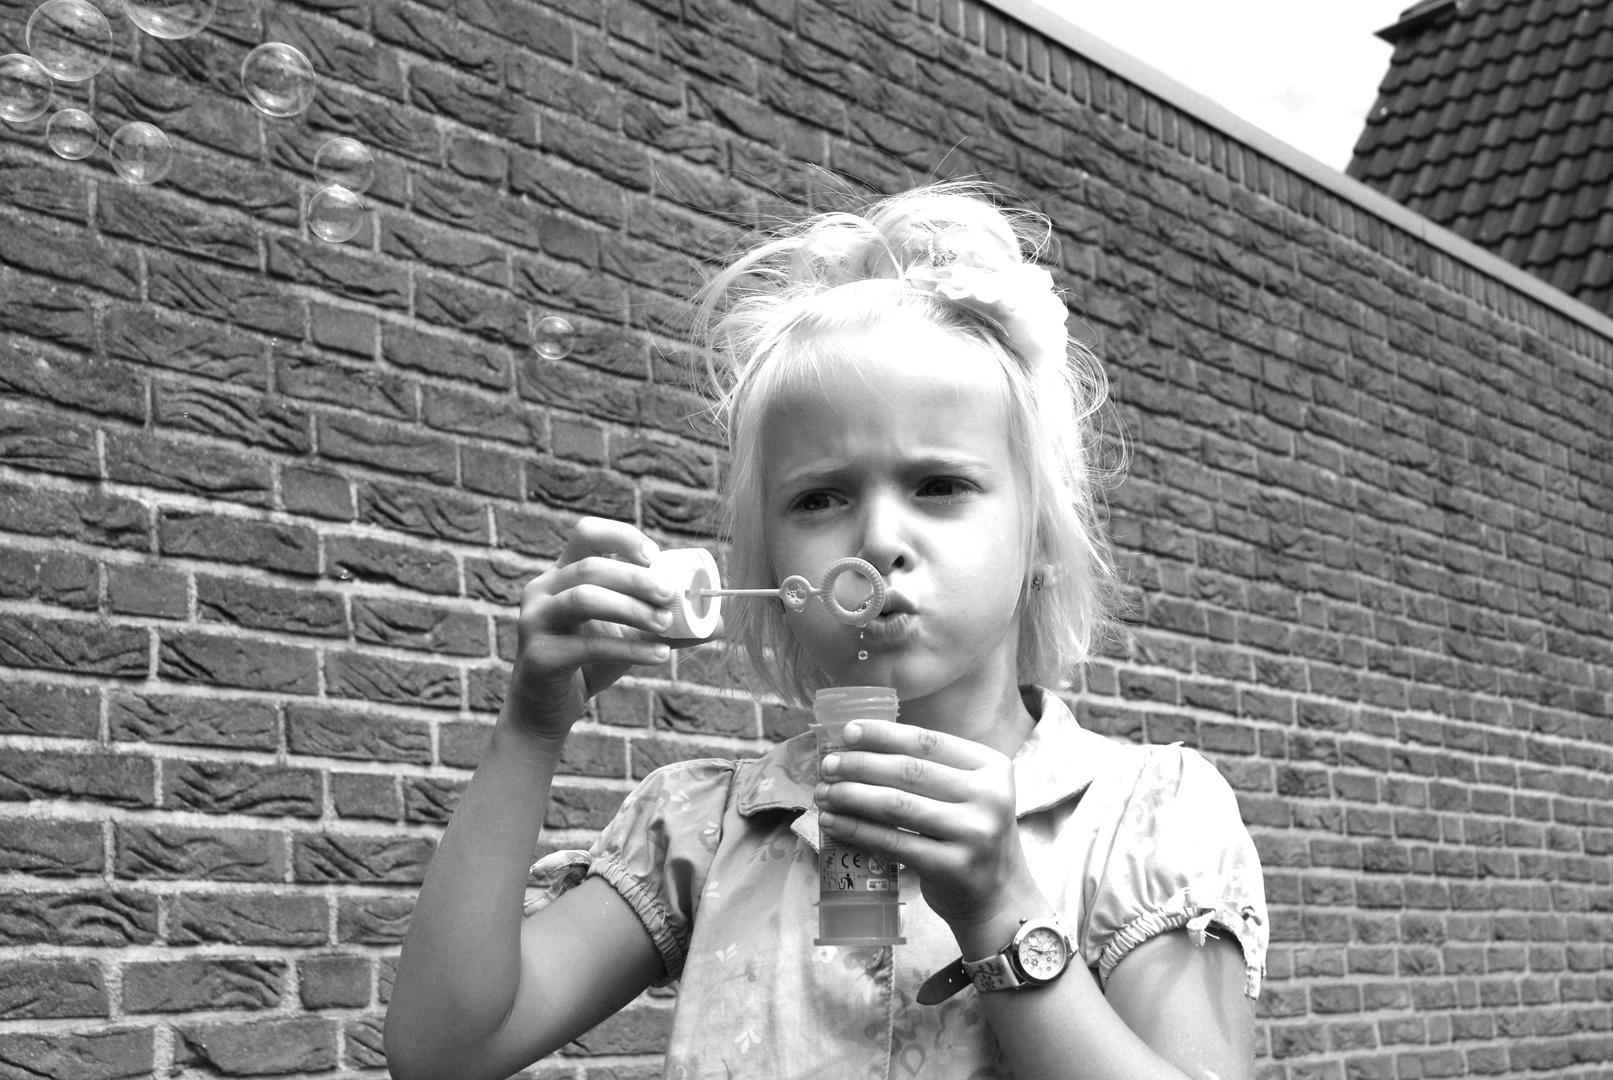 Soap-bubble girl - Seifenblasenmädchen